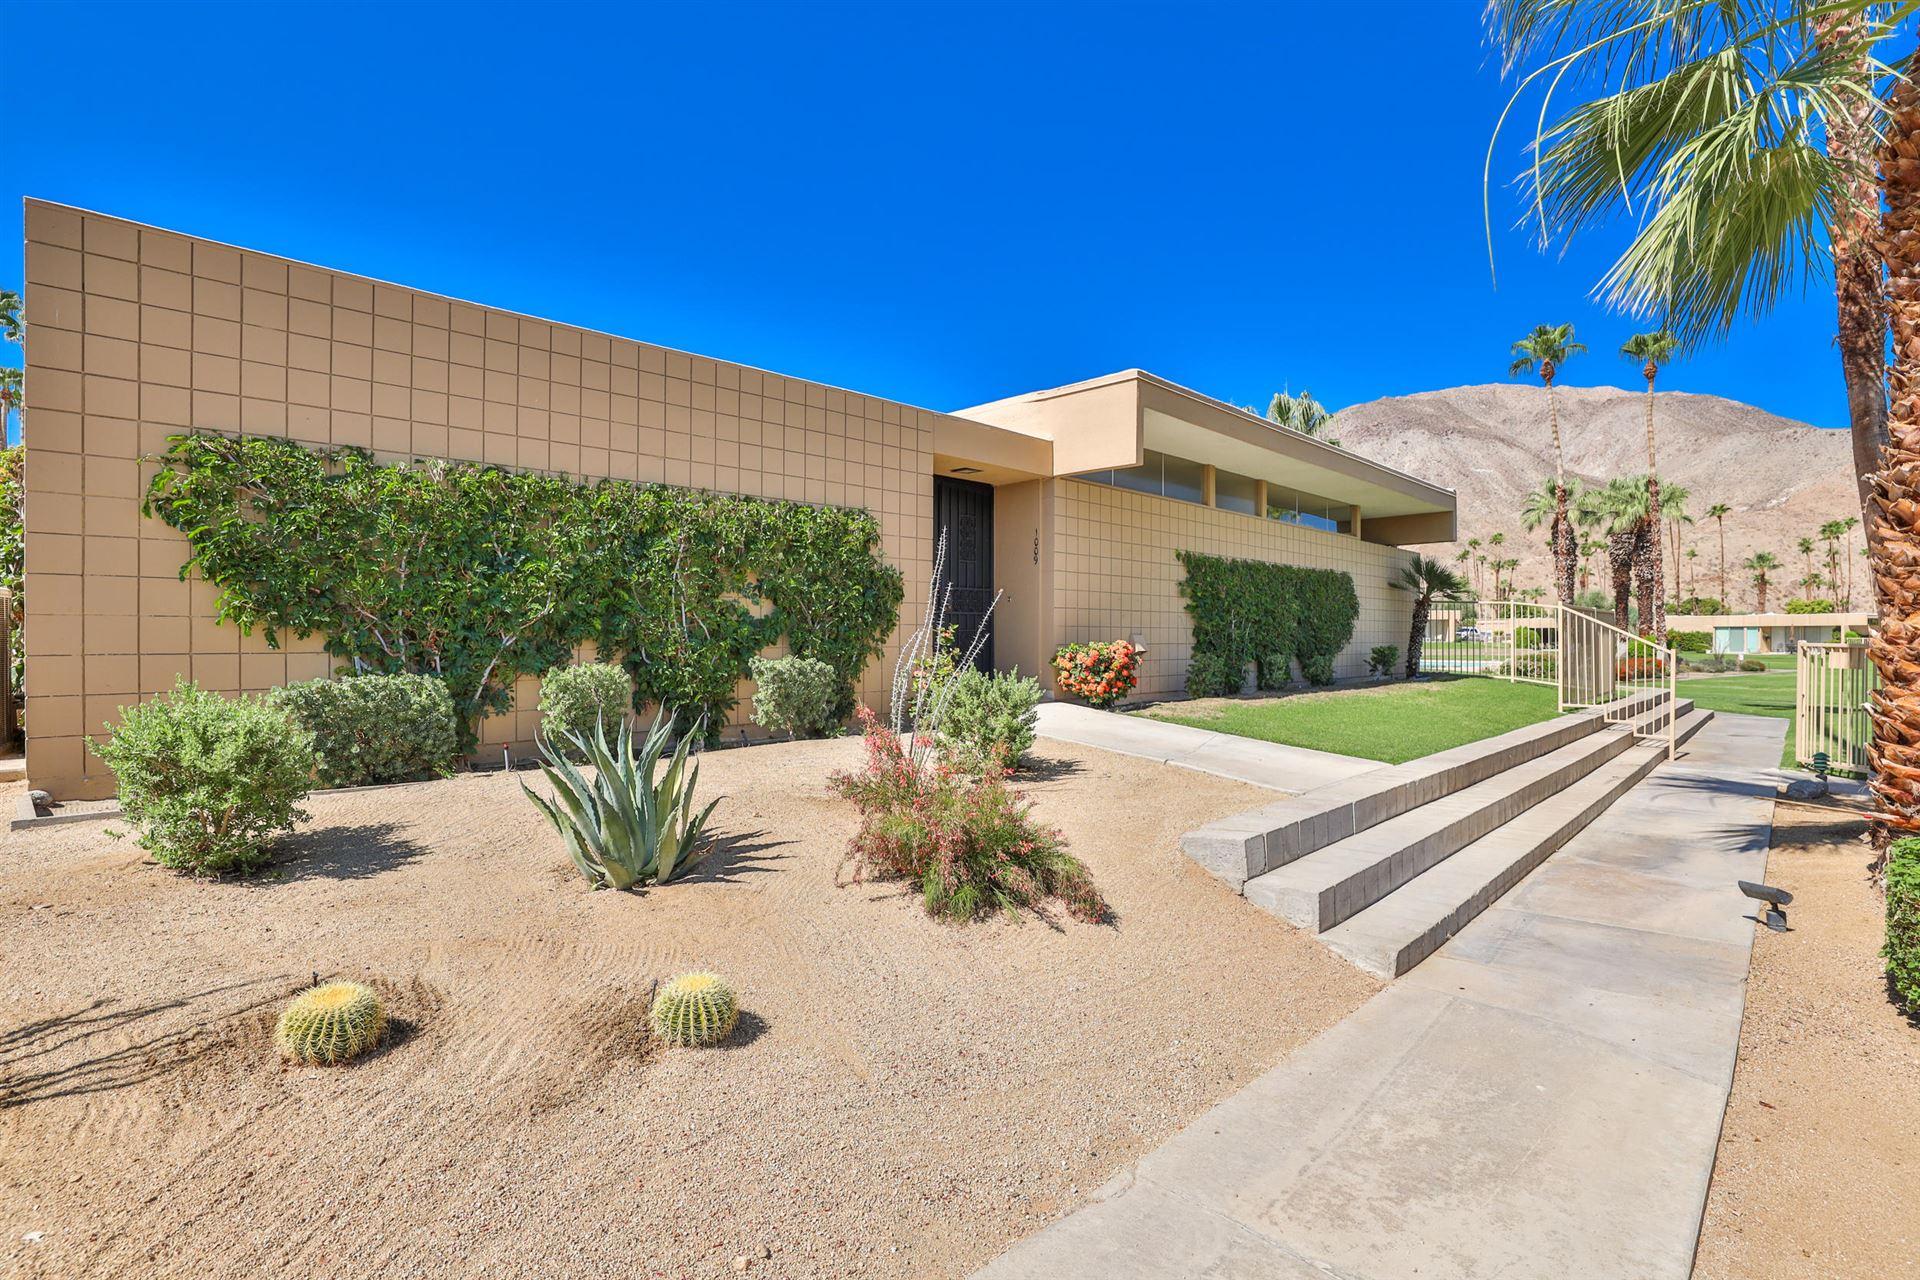 72551 El Paseo Street #1009, Palm Desert, CA 92260 - MLS#: 219046803